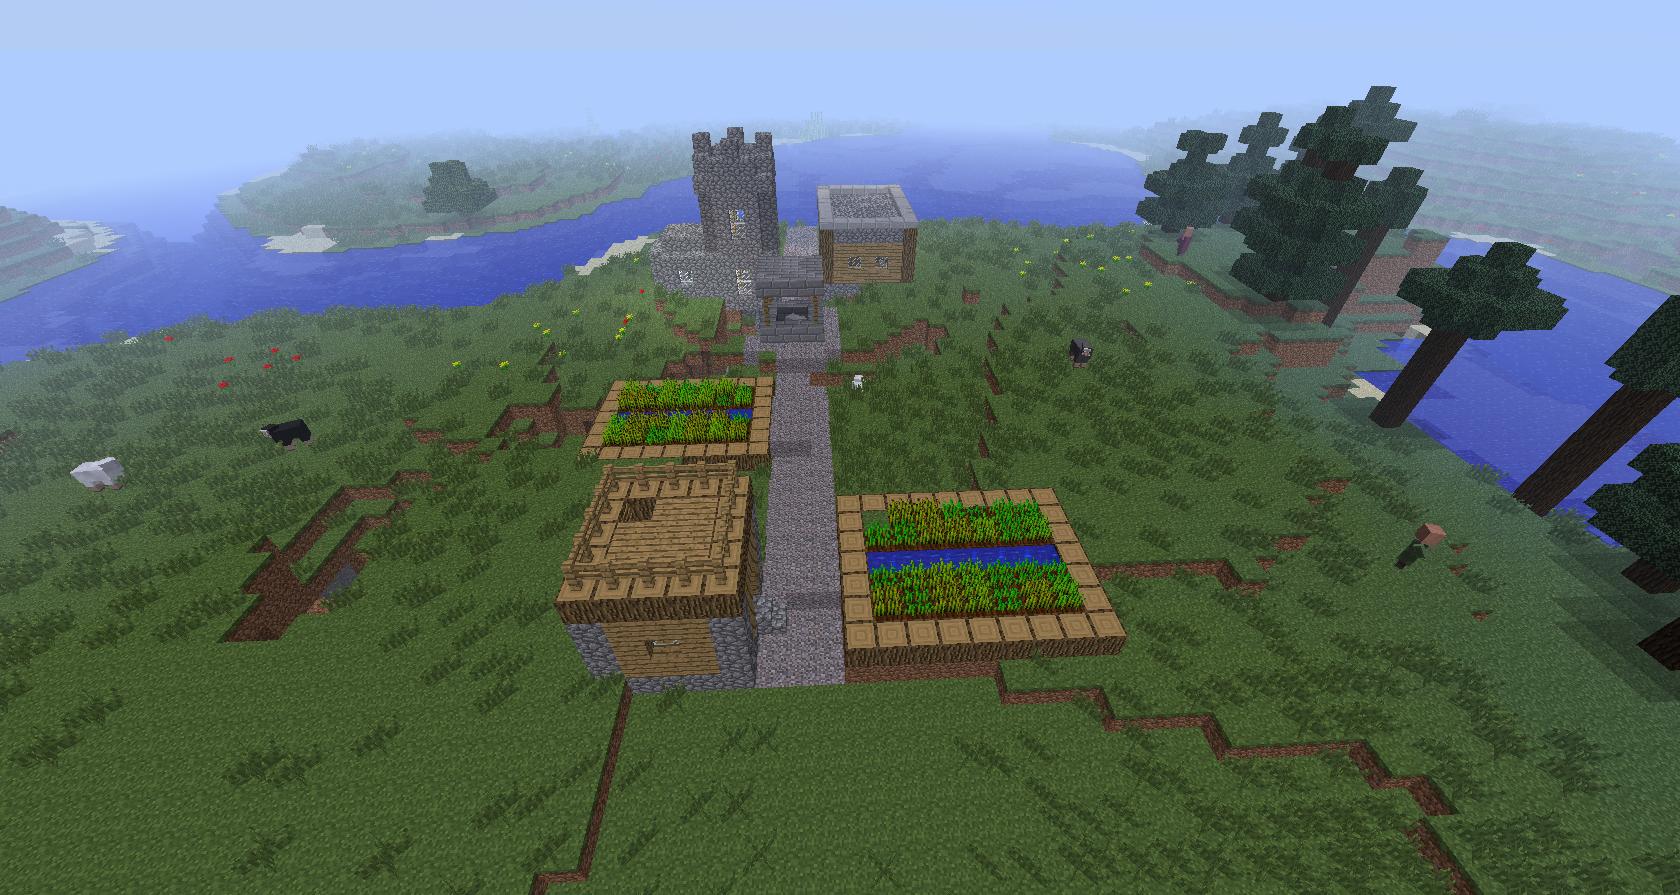 2011 12 20 11.27.45 [1.0.0] Village Mod (v1.1)